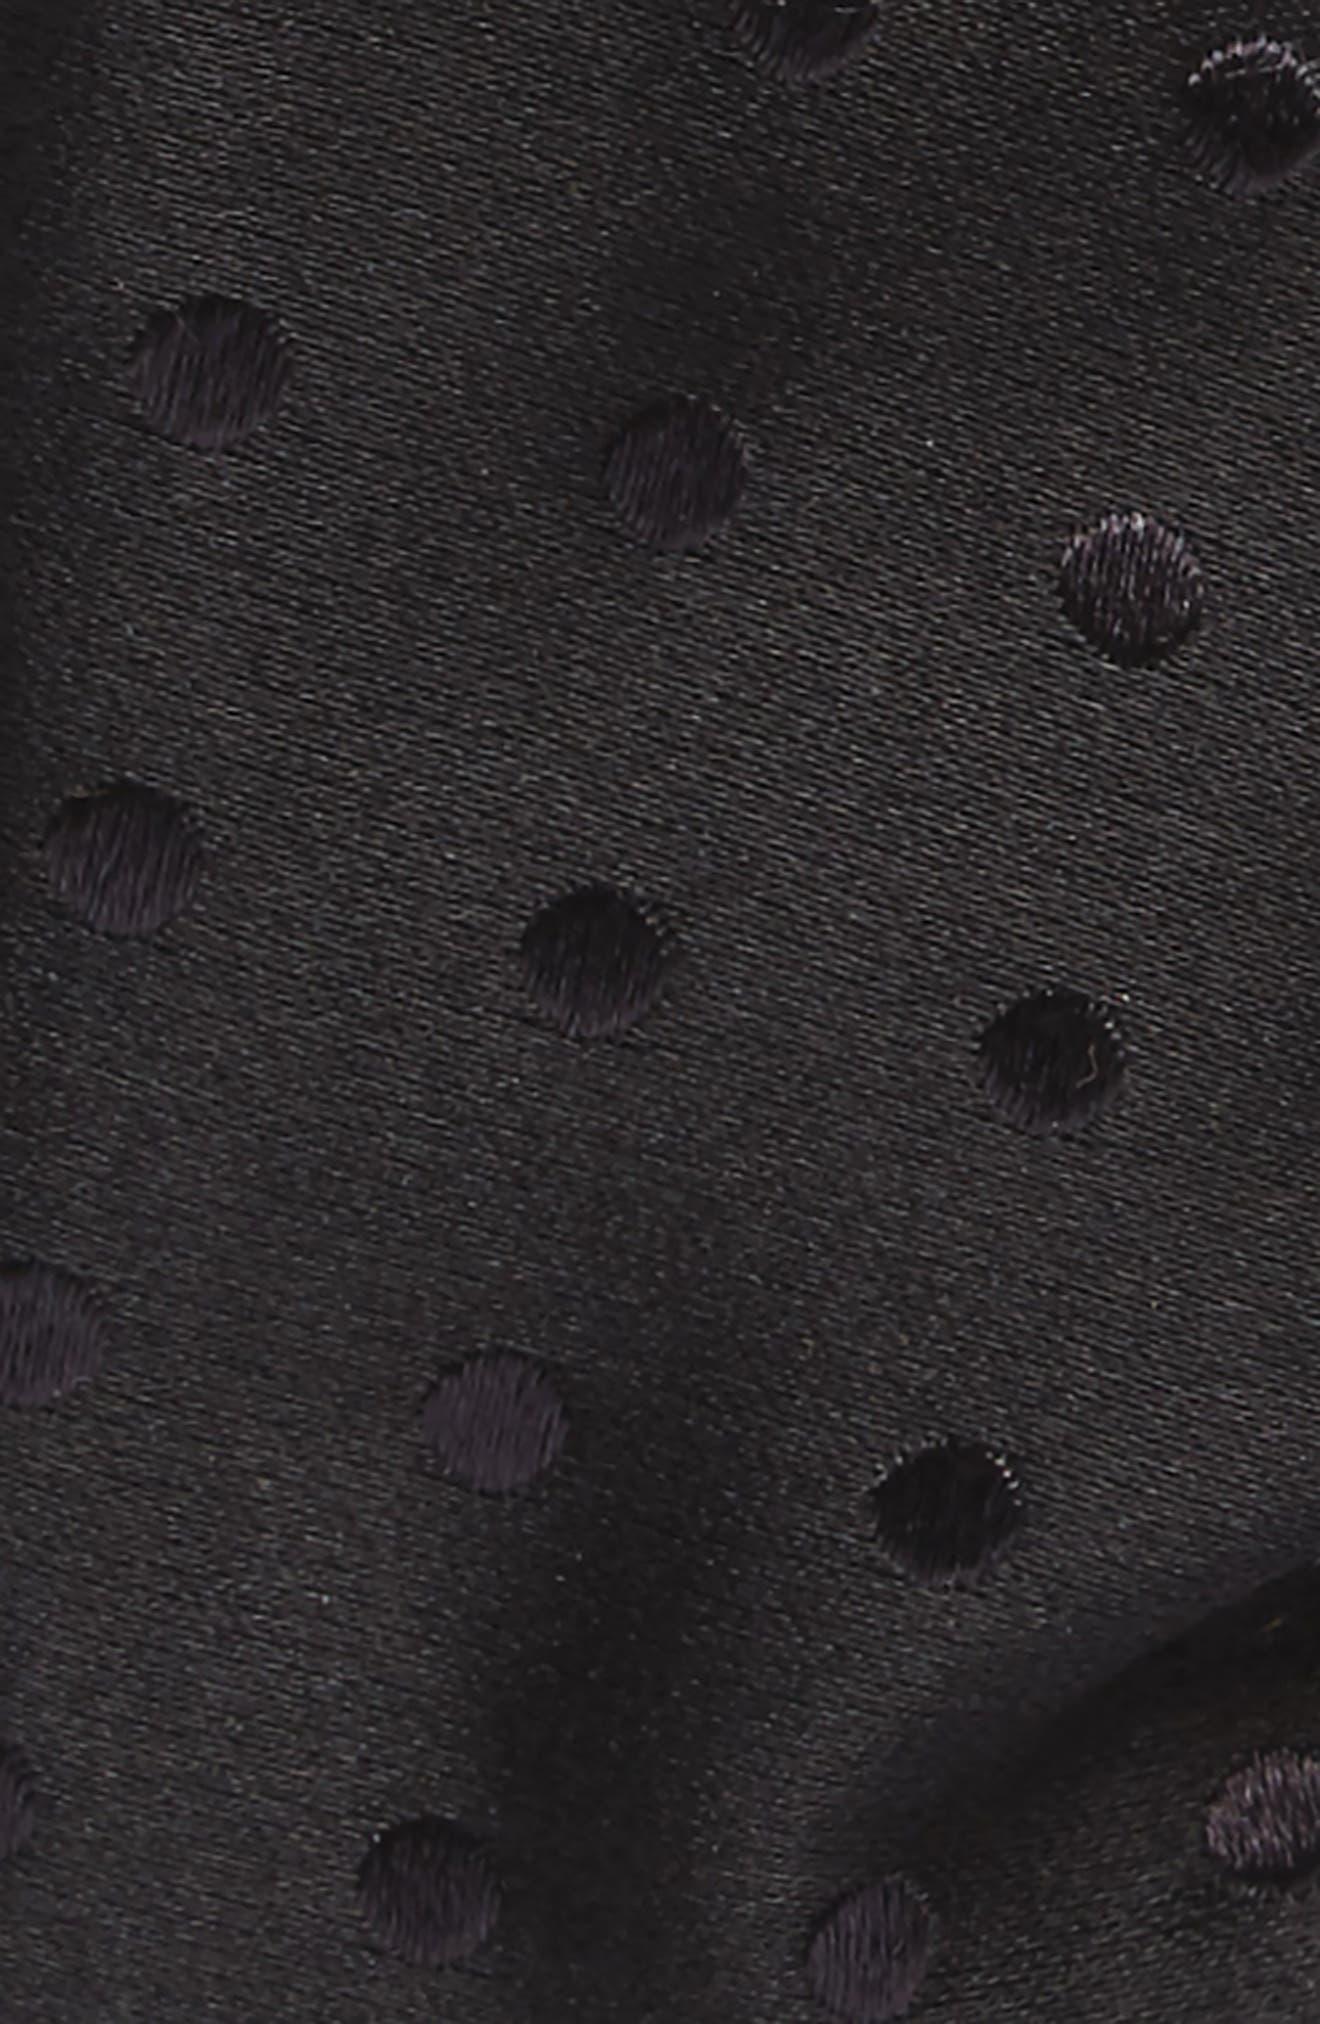 Dot Silk Bow Tie,                             Alternate thumbnail 2, color,                             Black